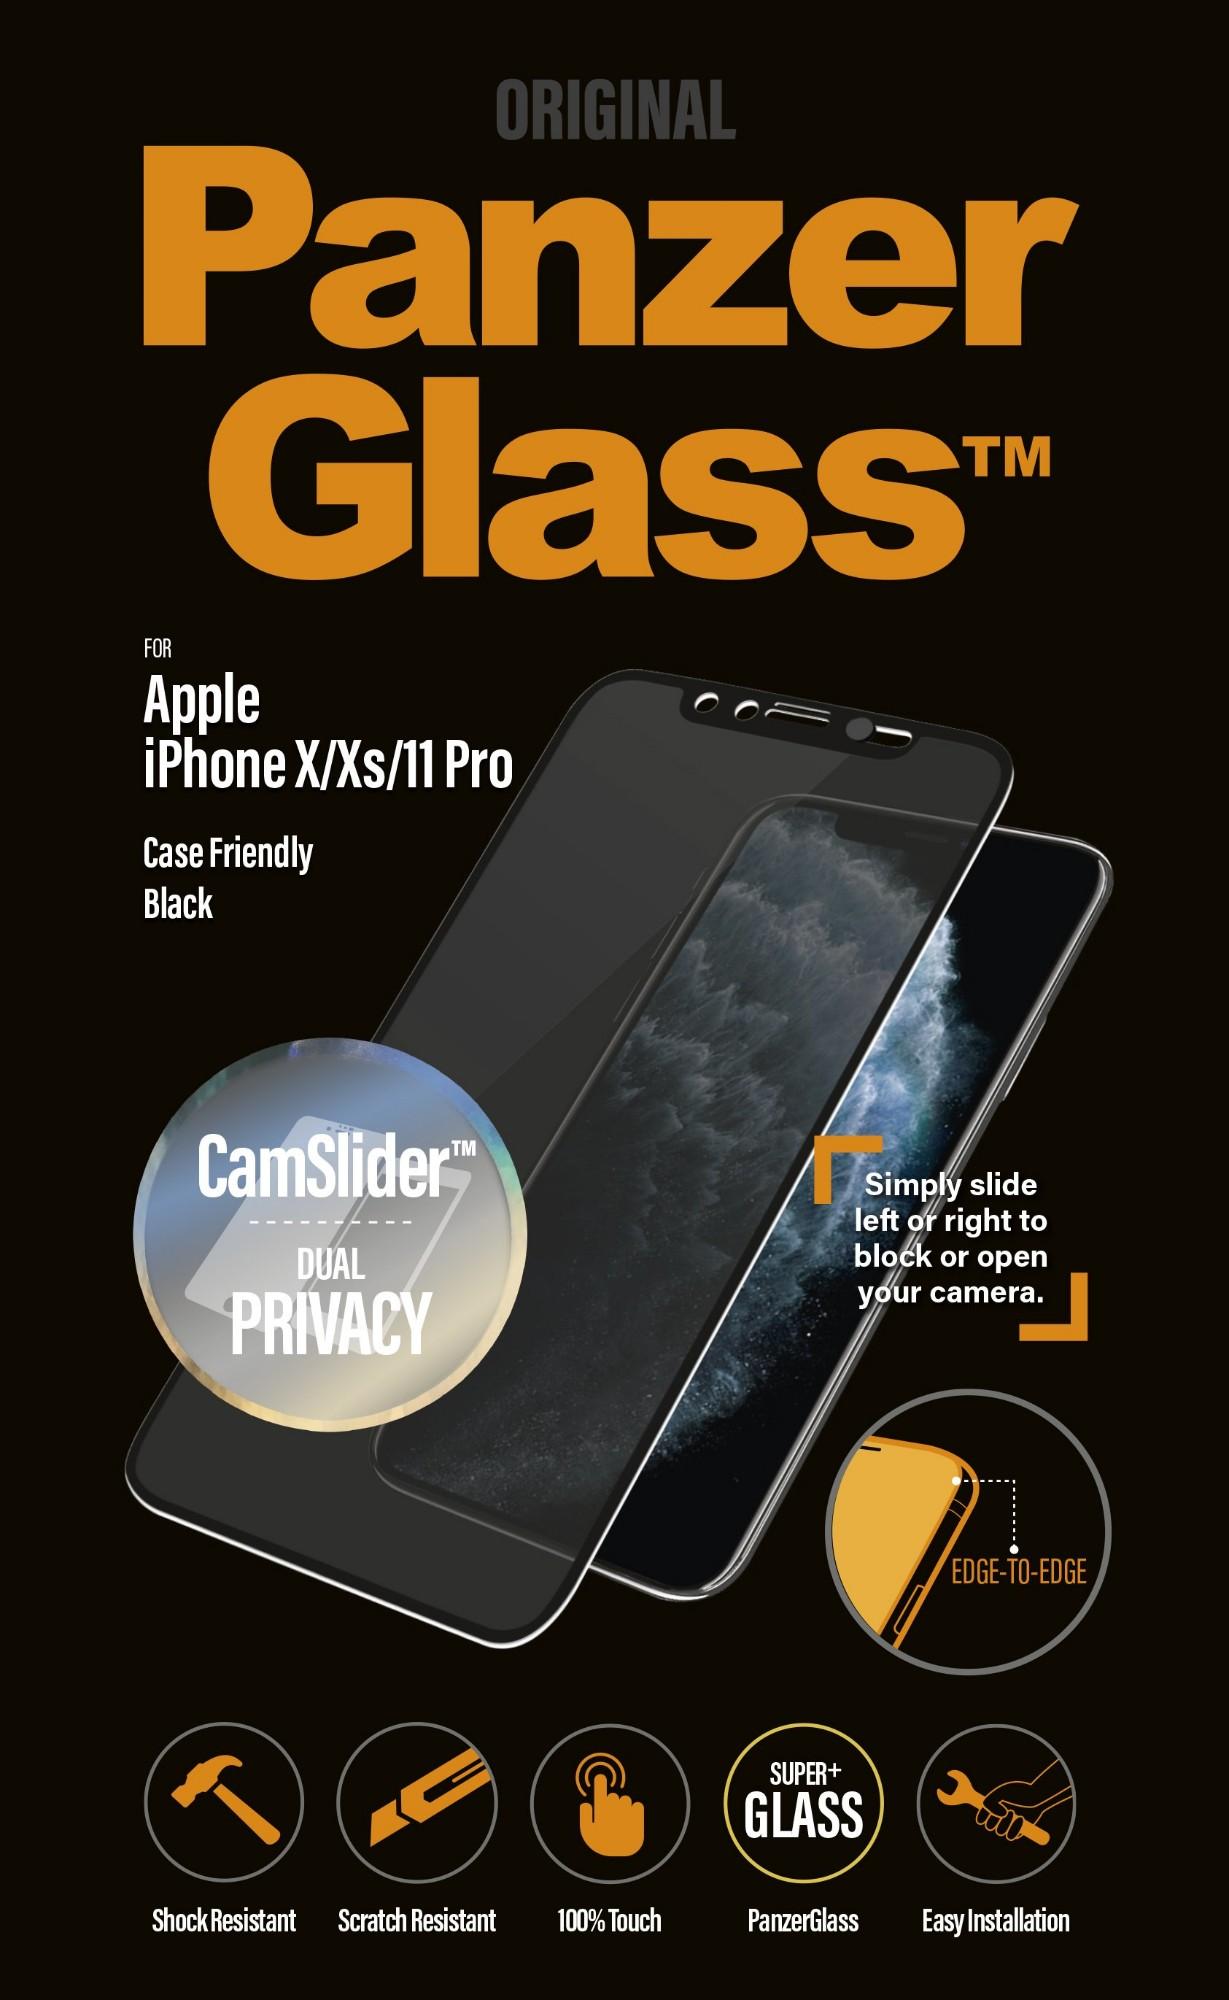 PanzerGlass P2667 protector de pantalla Protector de pantalla anti-reflejante Teléfono móvil/smartphone Apple 1 pieza(s)